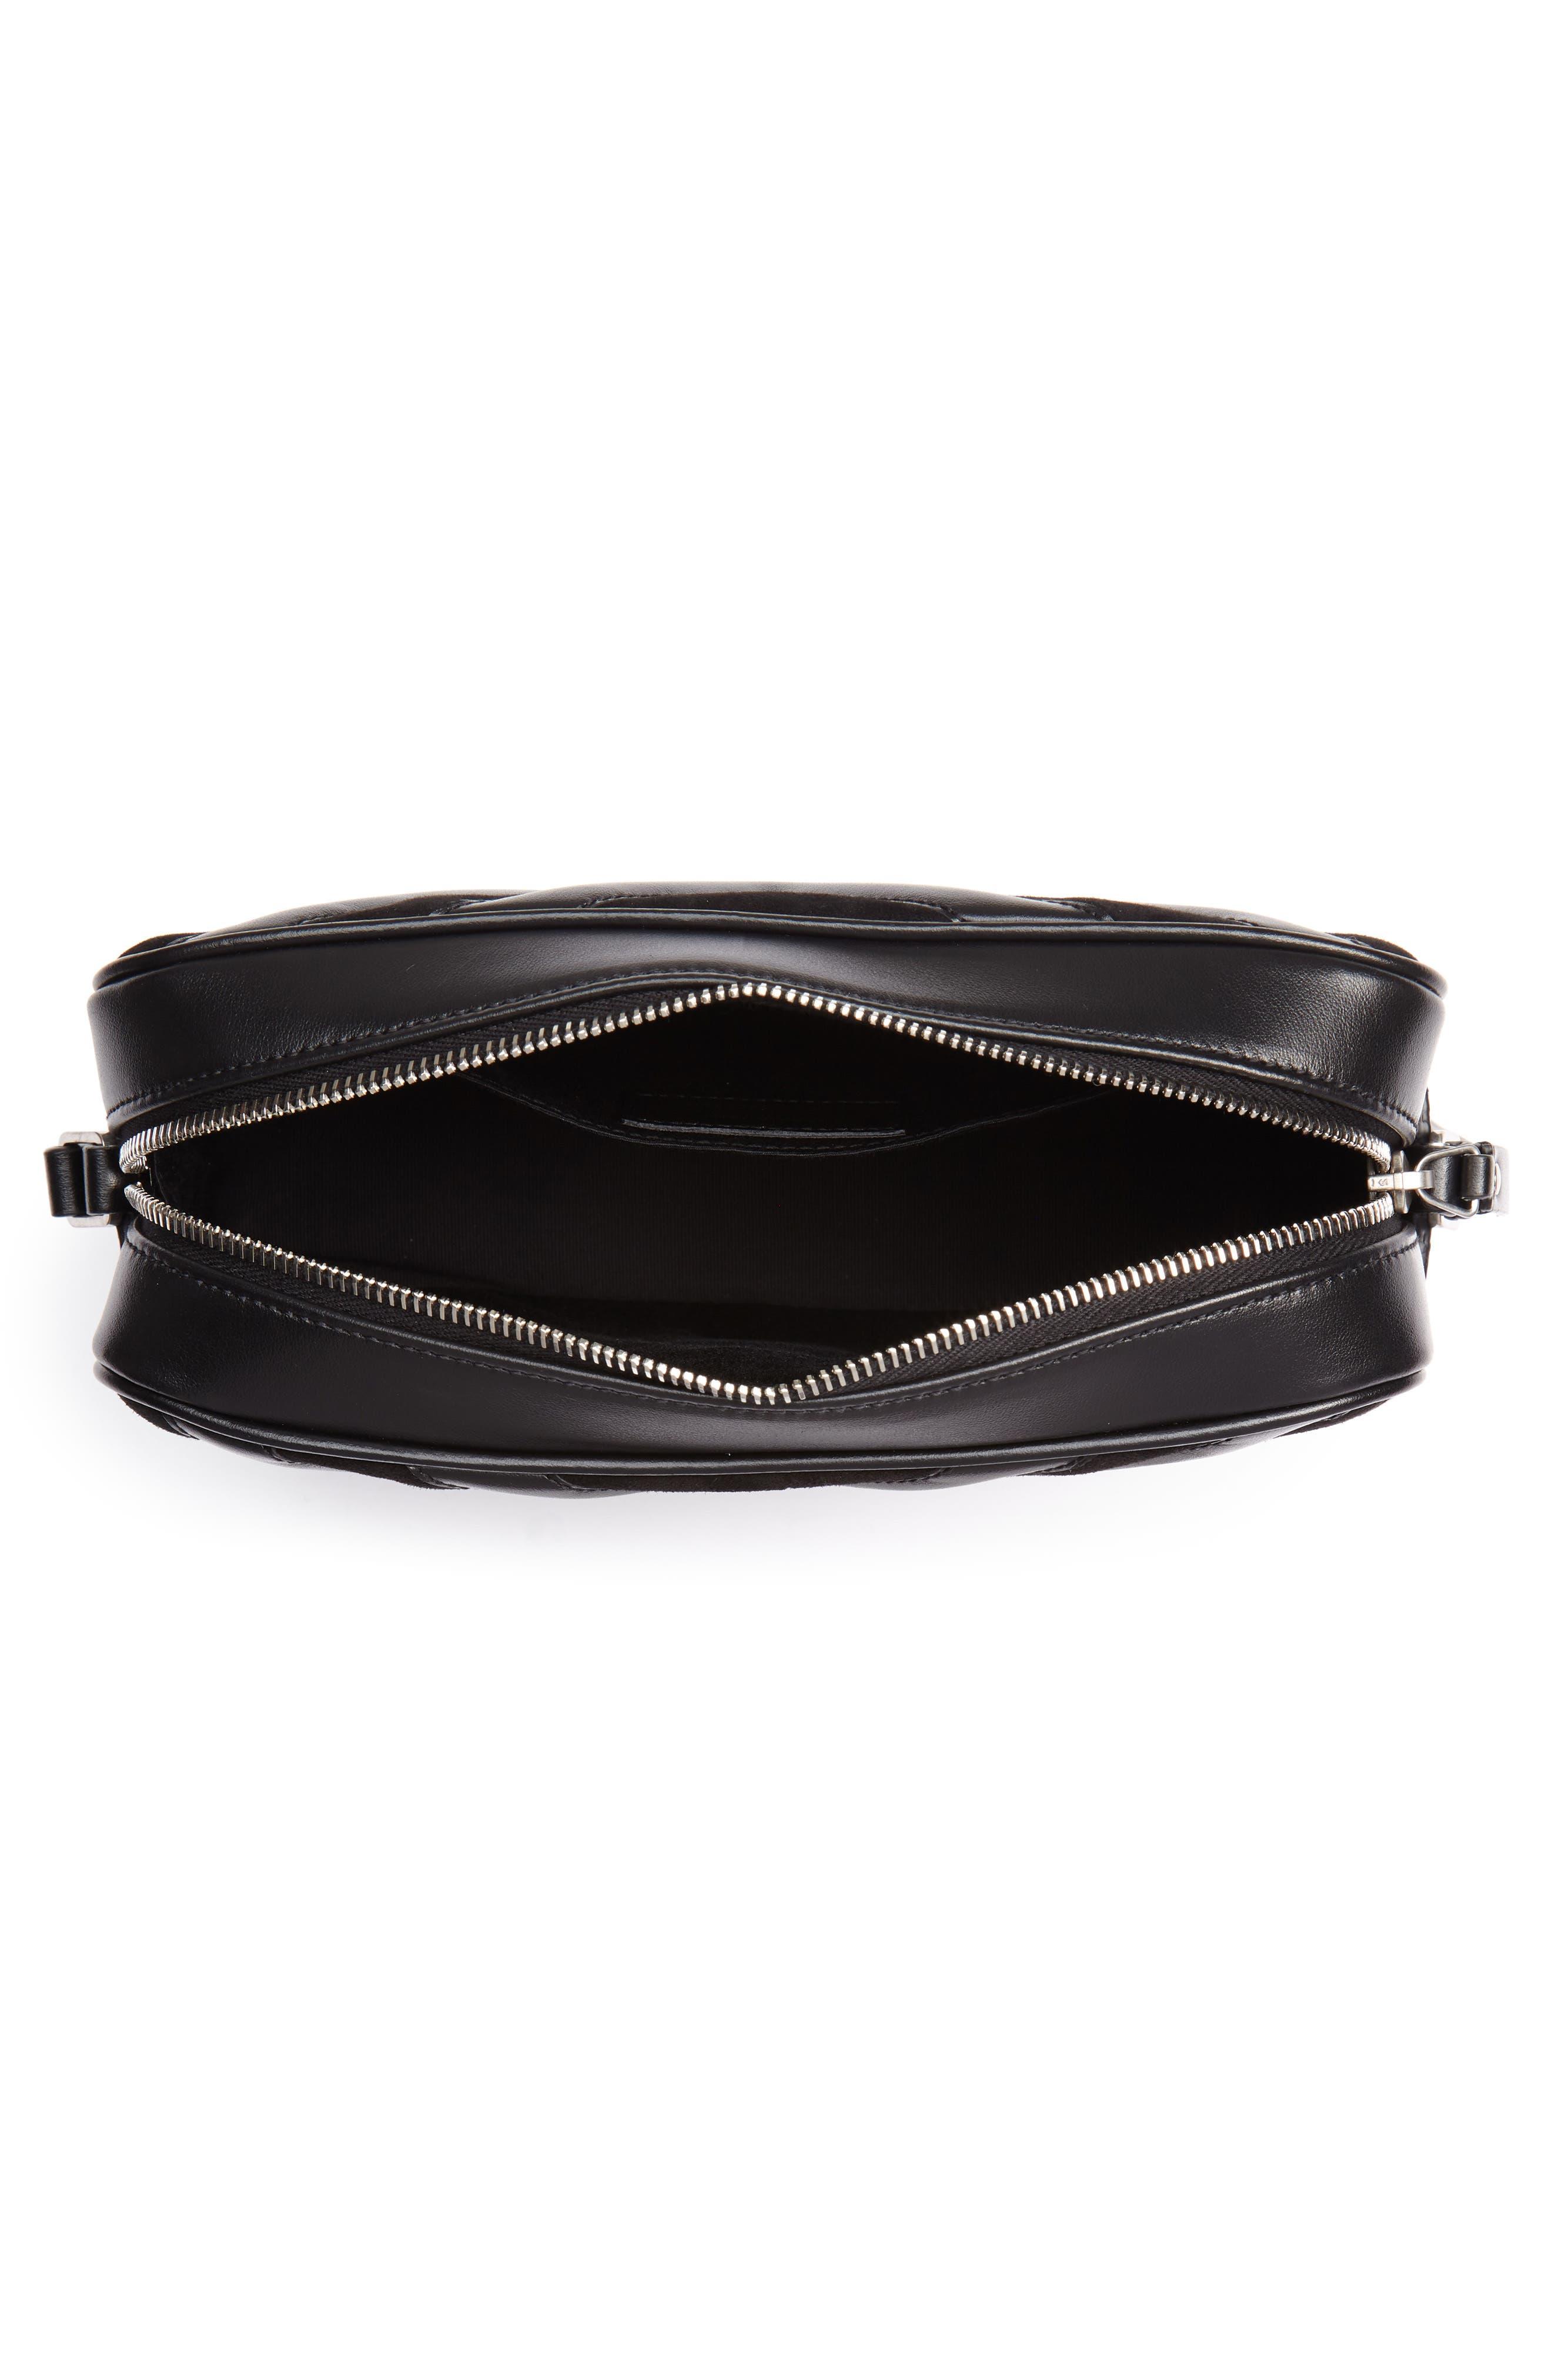 Medium Lou Leather & Suede Camera Bag,                             Alternate thumbnail 4, color,                             Noir